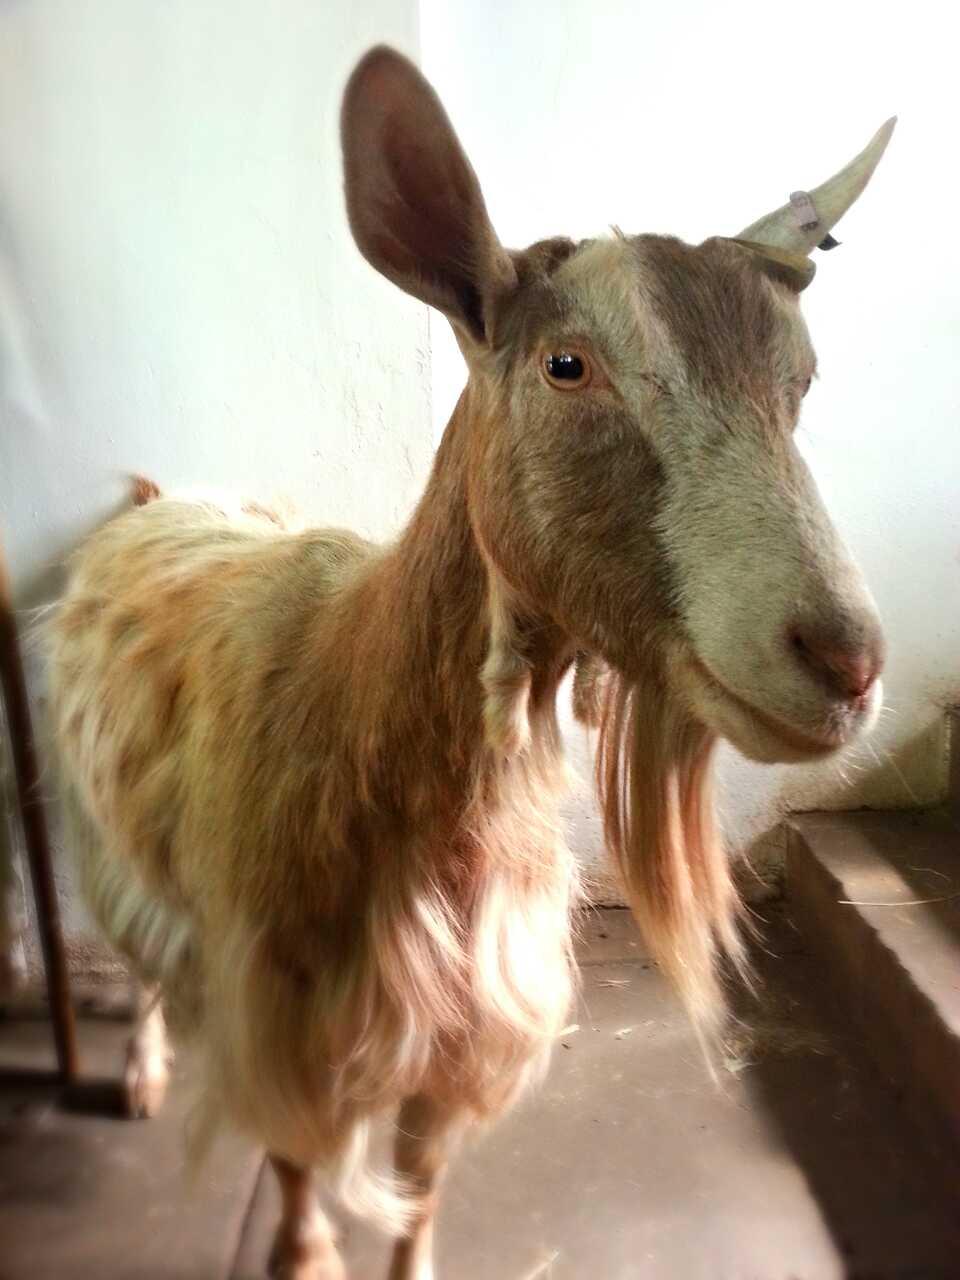 Jessica (Goat)